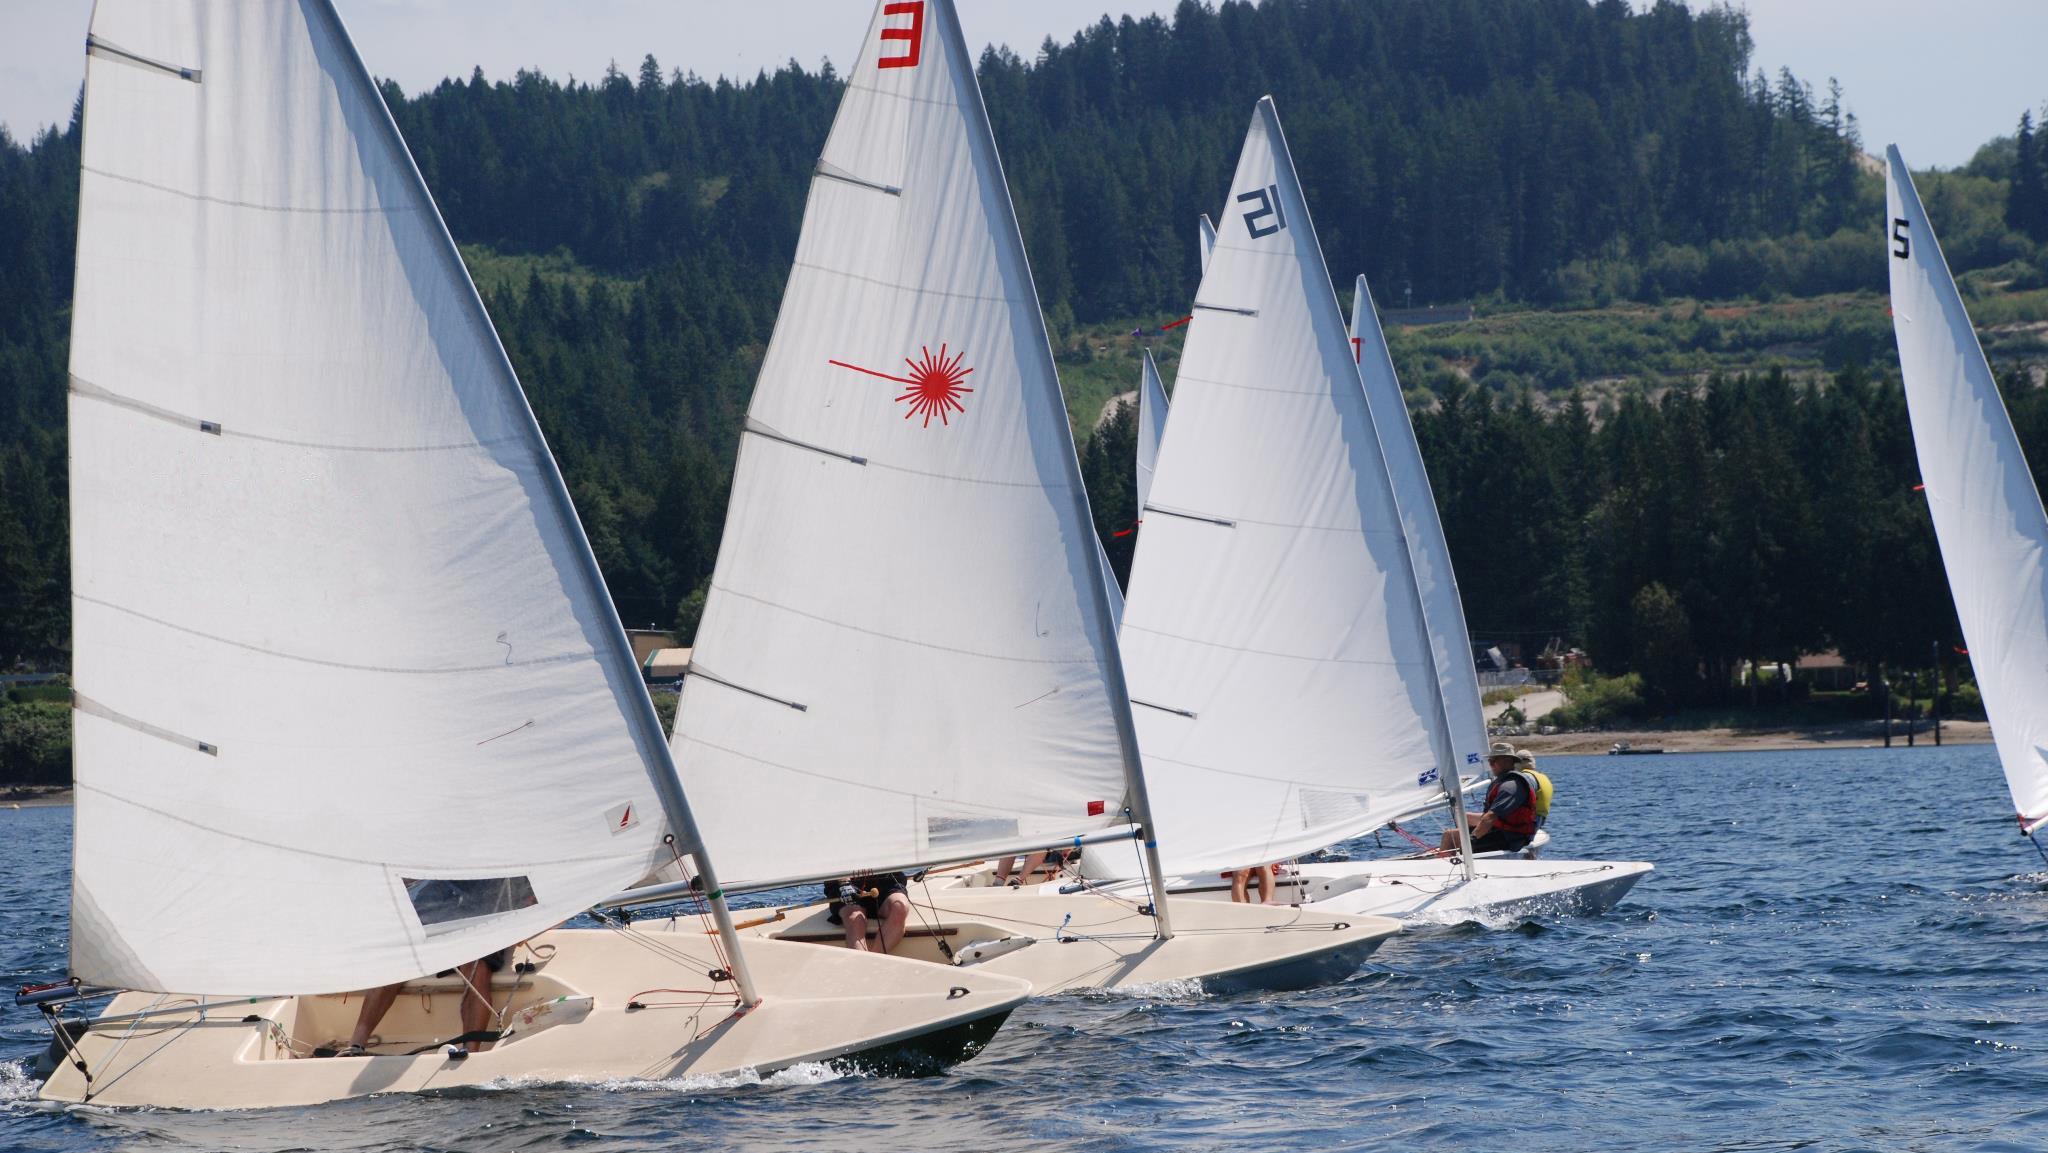 Home Scsa Sunshine Coast Sailing Association